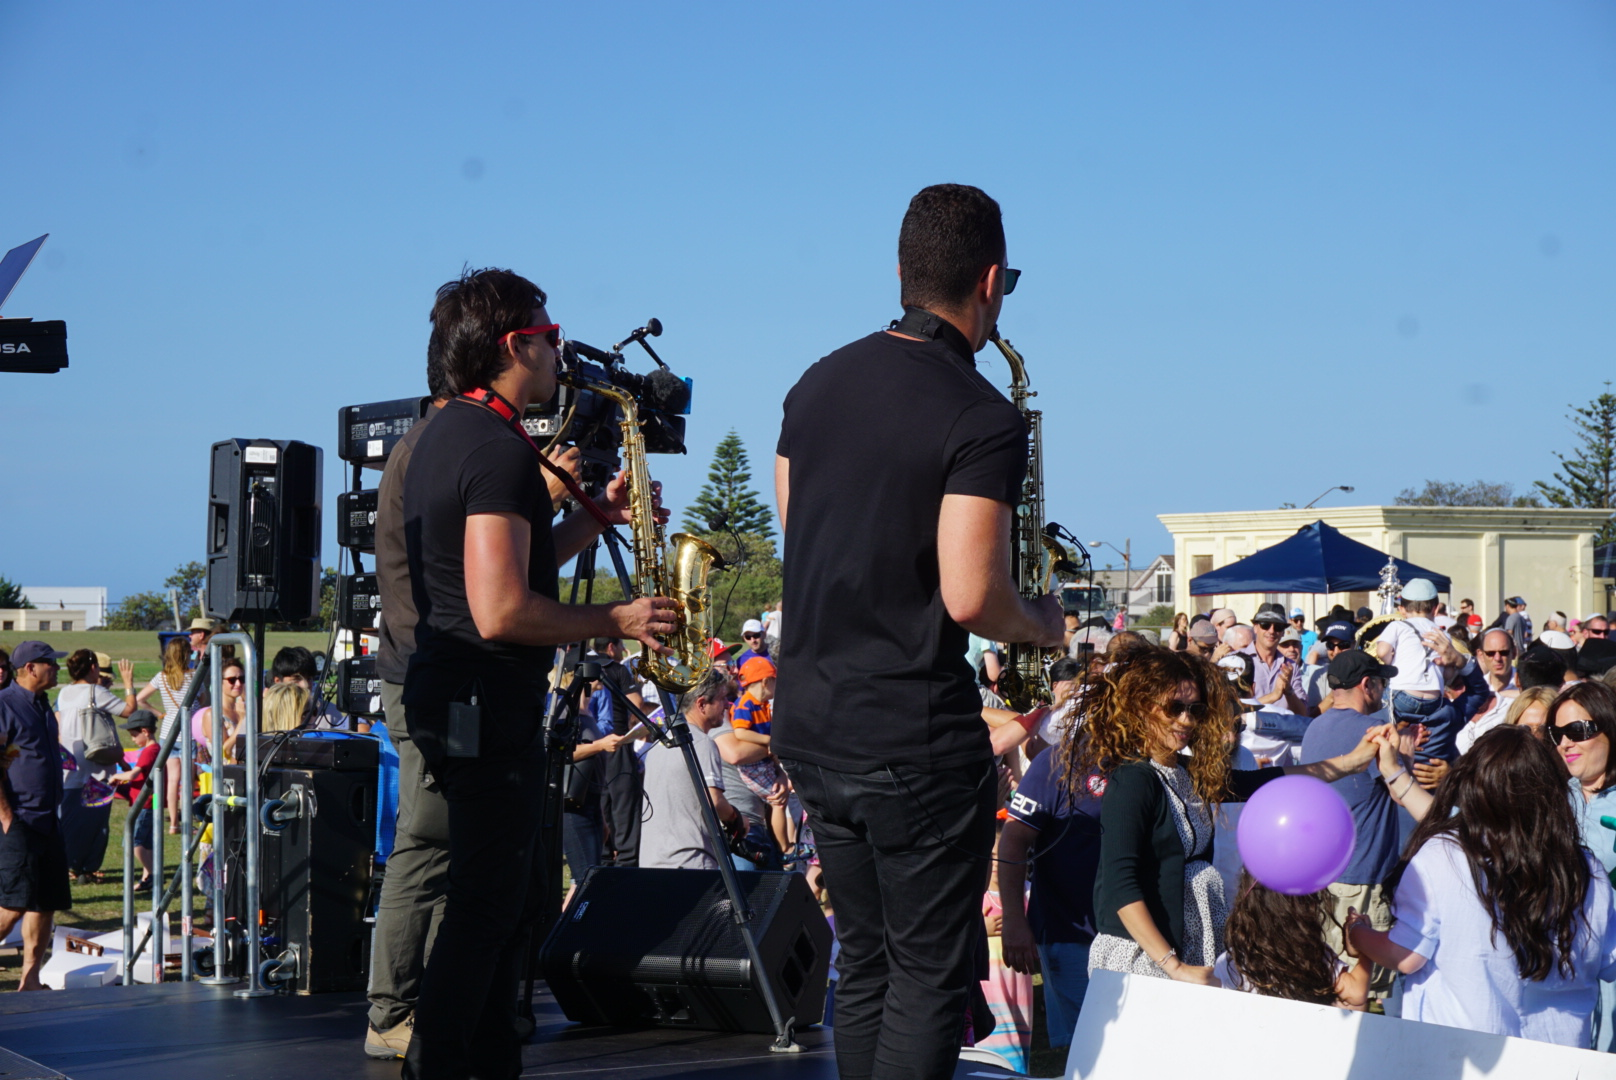 Sydney event bands